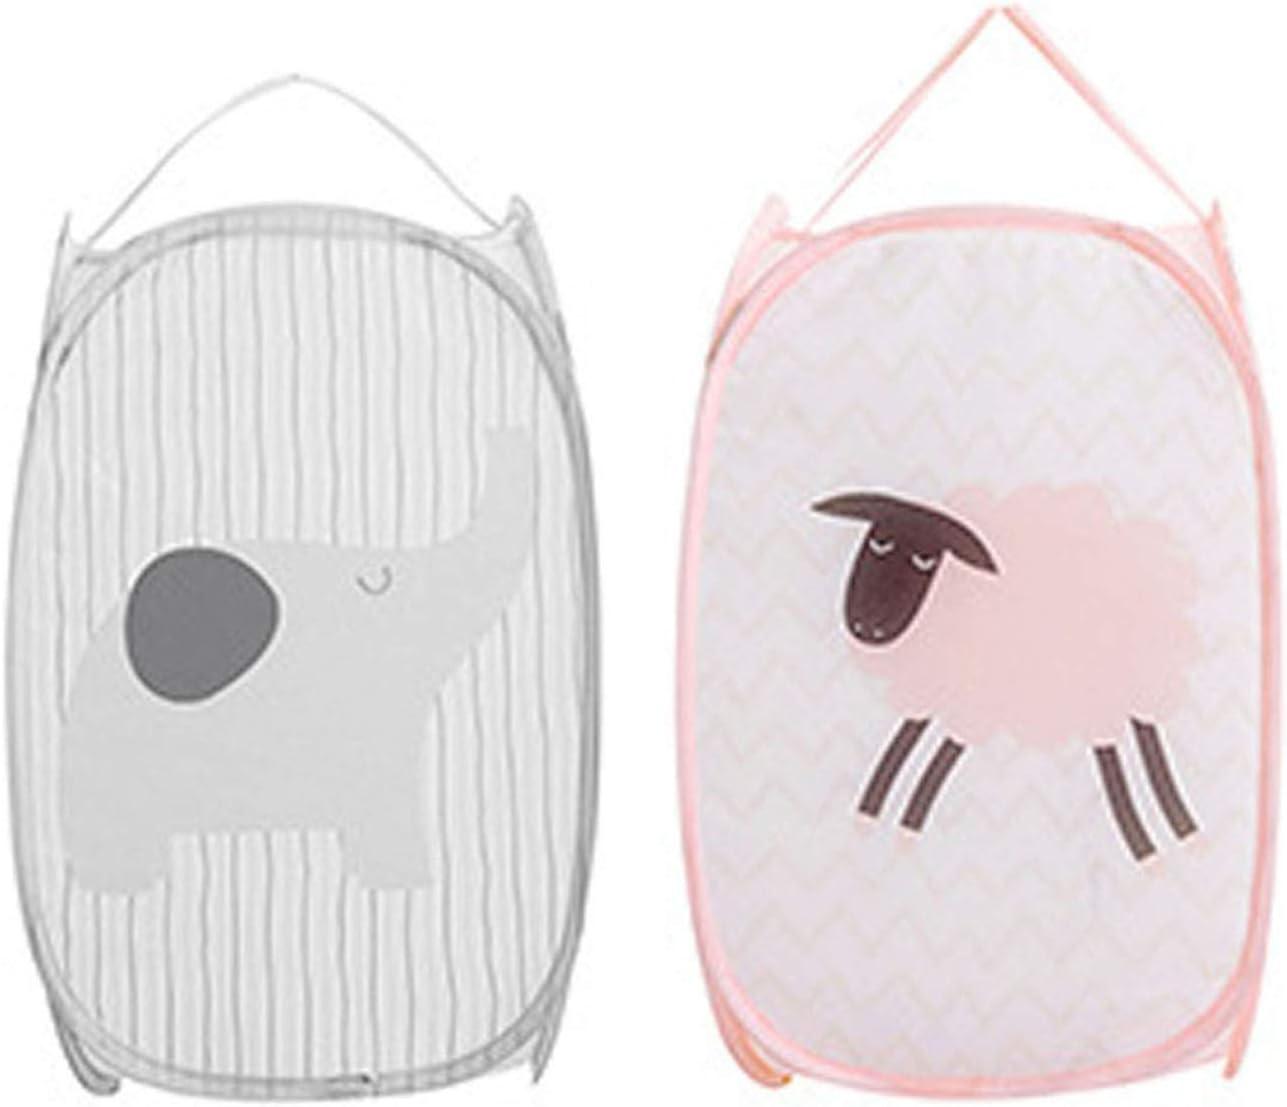 Foldable Mesh Pop-Up Laundry Hamper-Durable Mesh Hamper Clothes Laundry Basket Storage Bag with Side Pocket (Grey+Pink Animal)